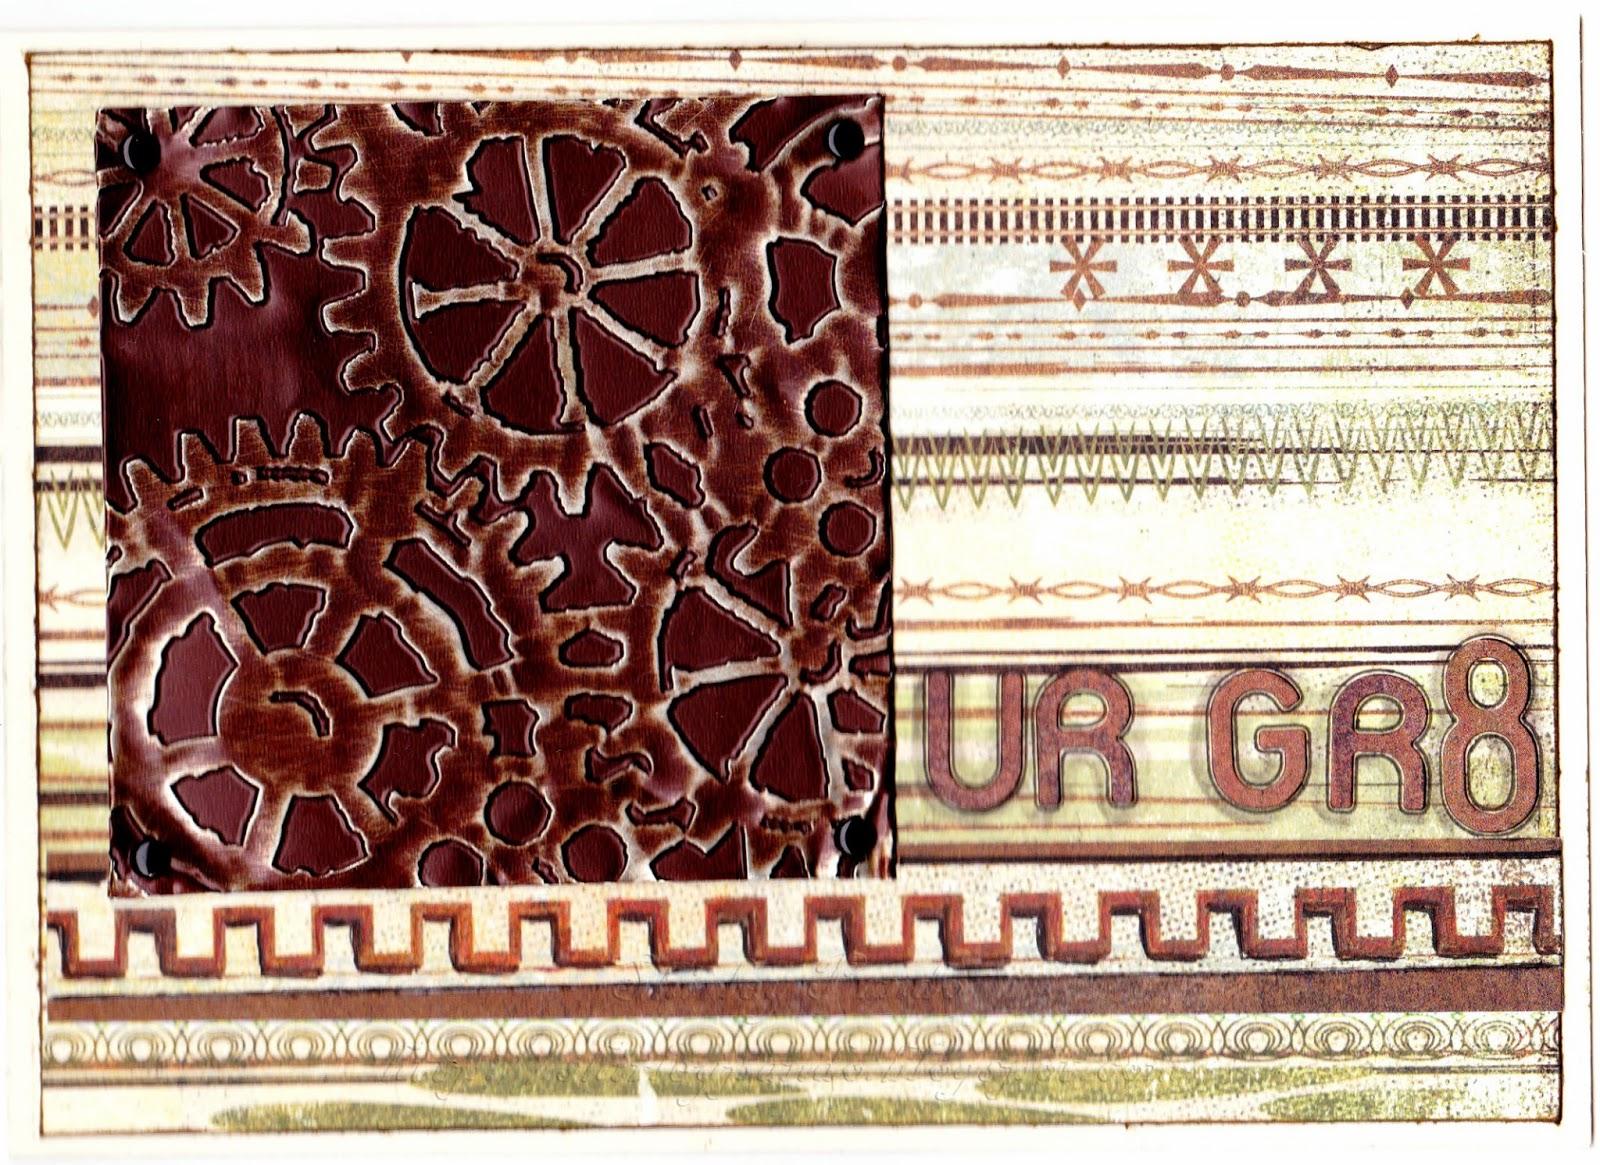 UR GR8 card